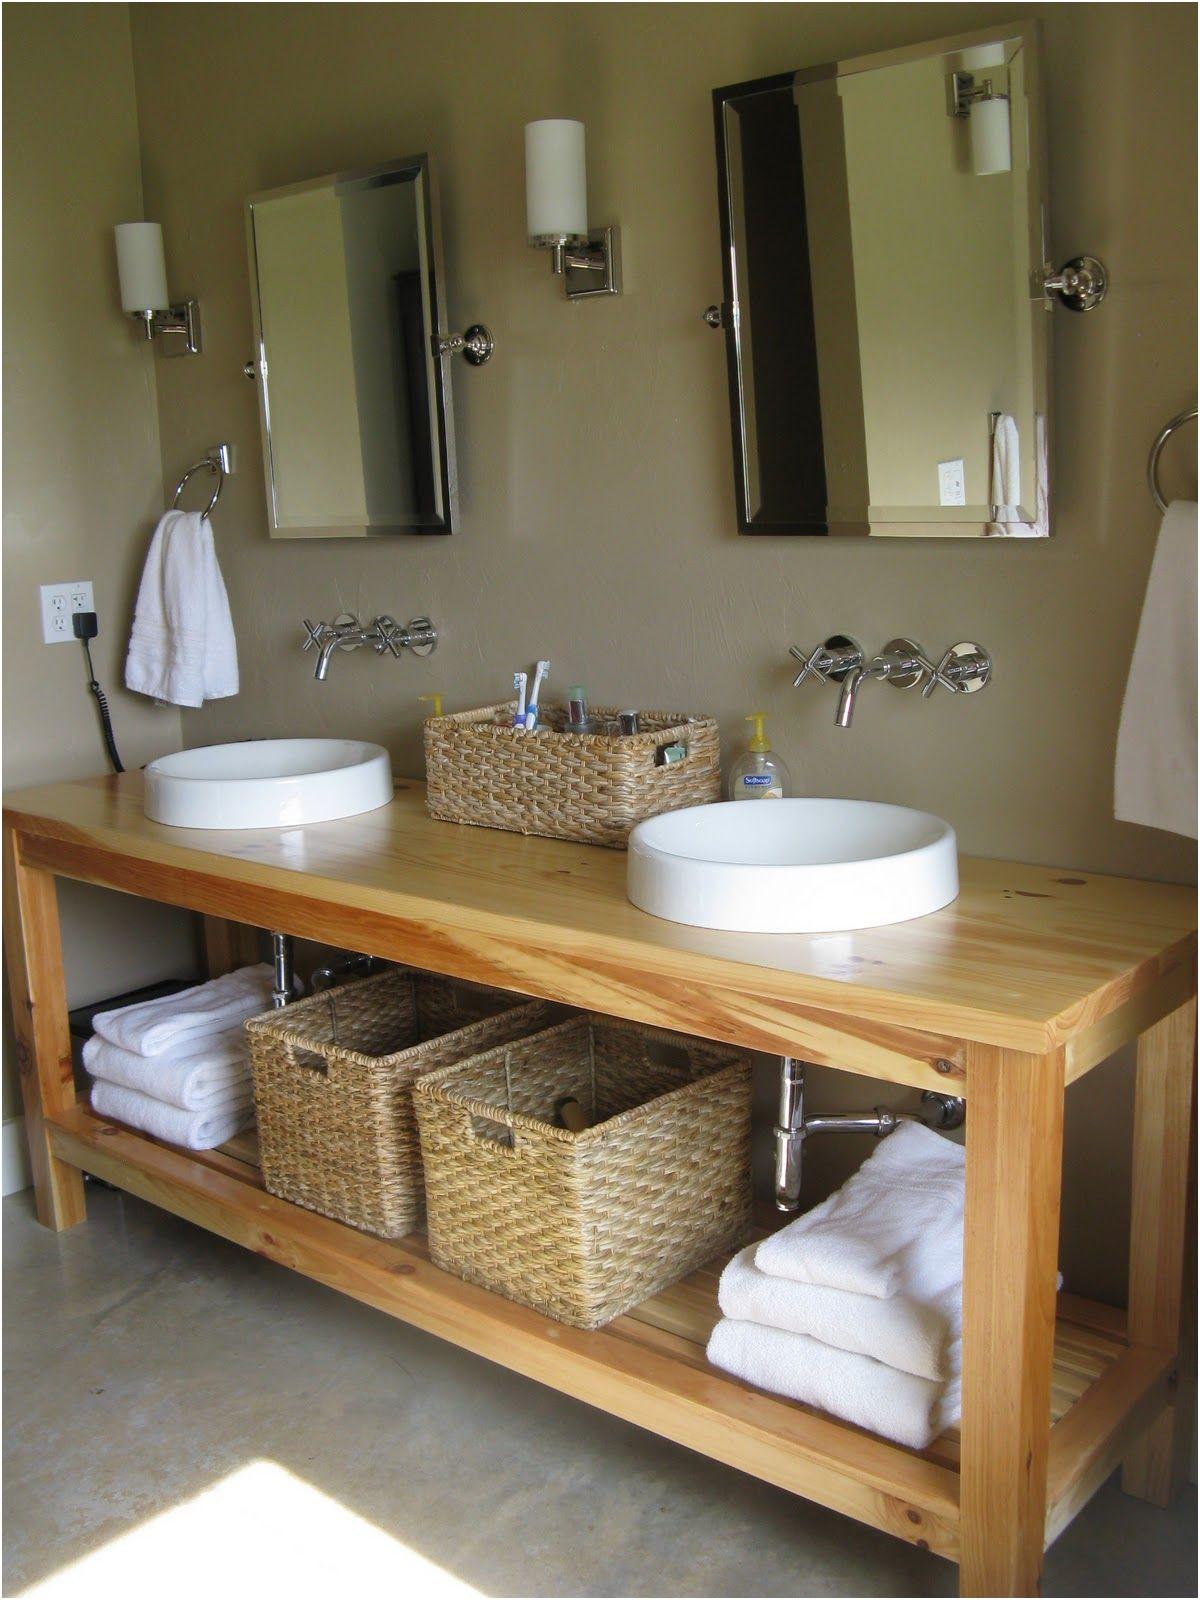 Bathroom Cabinets for Bowl Sinks Lovely Open Bathroom Vanity Healthy Home Design